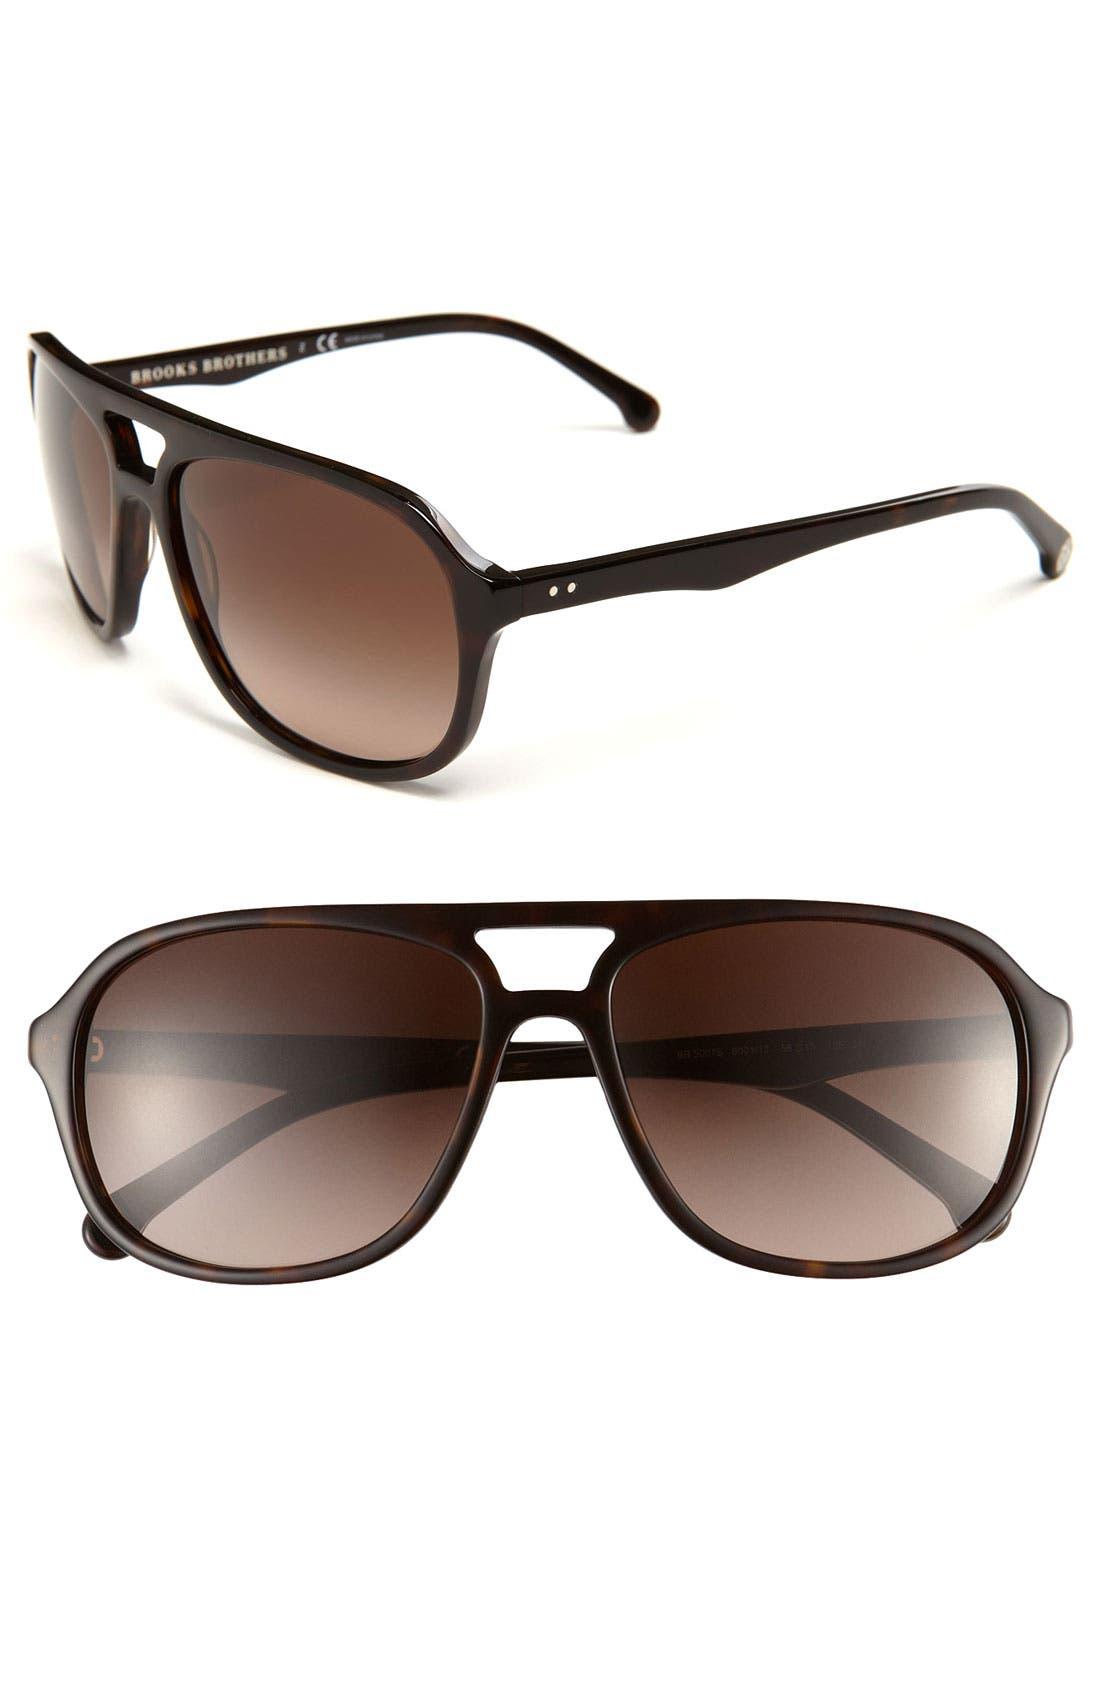 Alternate Image 1 Selected - Brooks Brothers Square 58mm Aviator Sunglasses